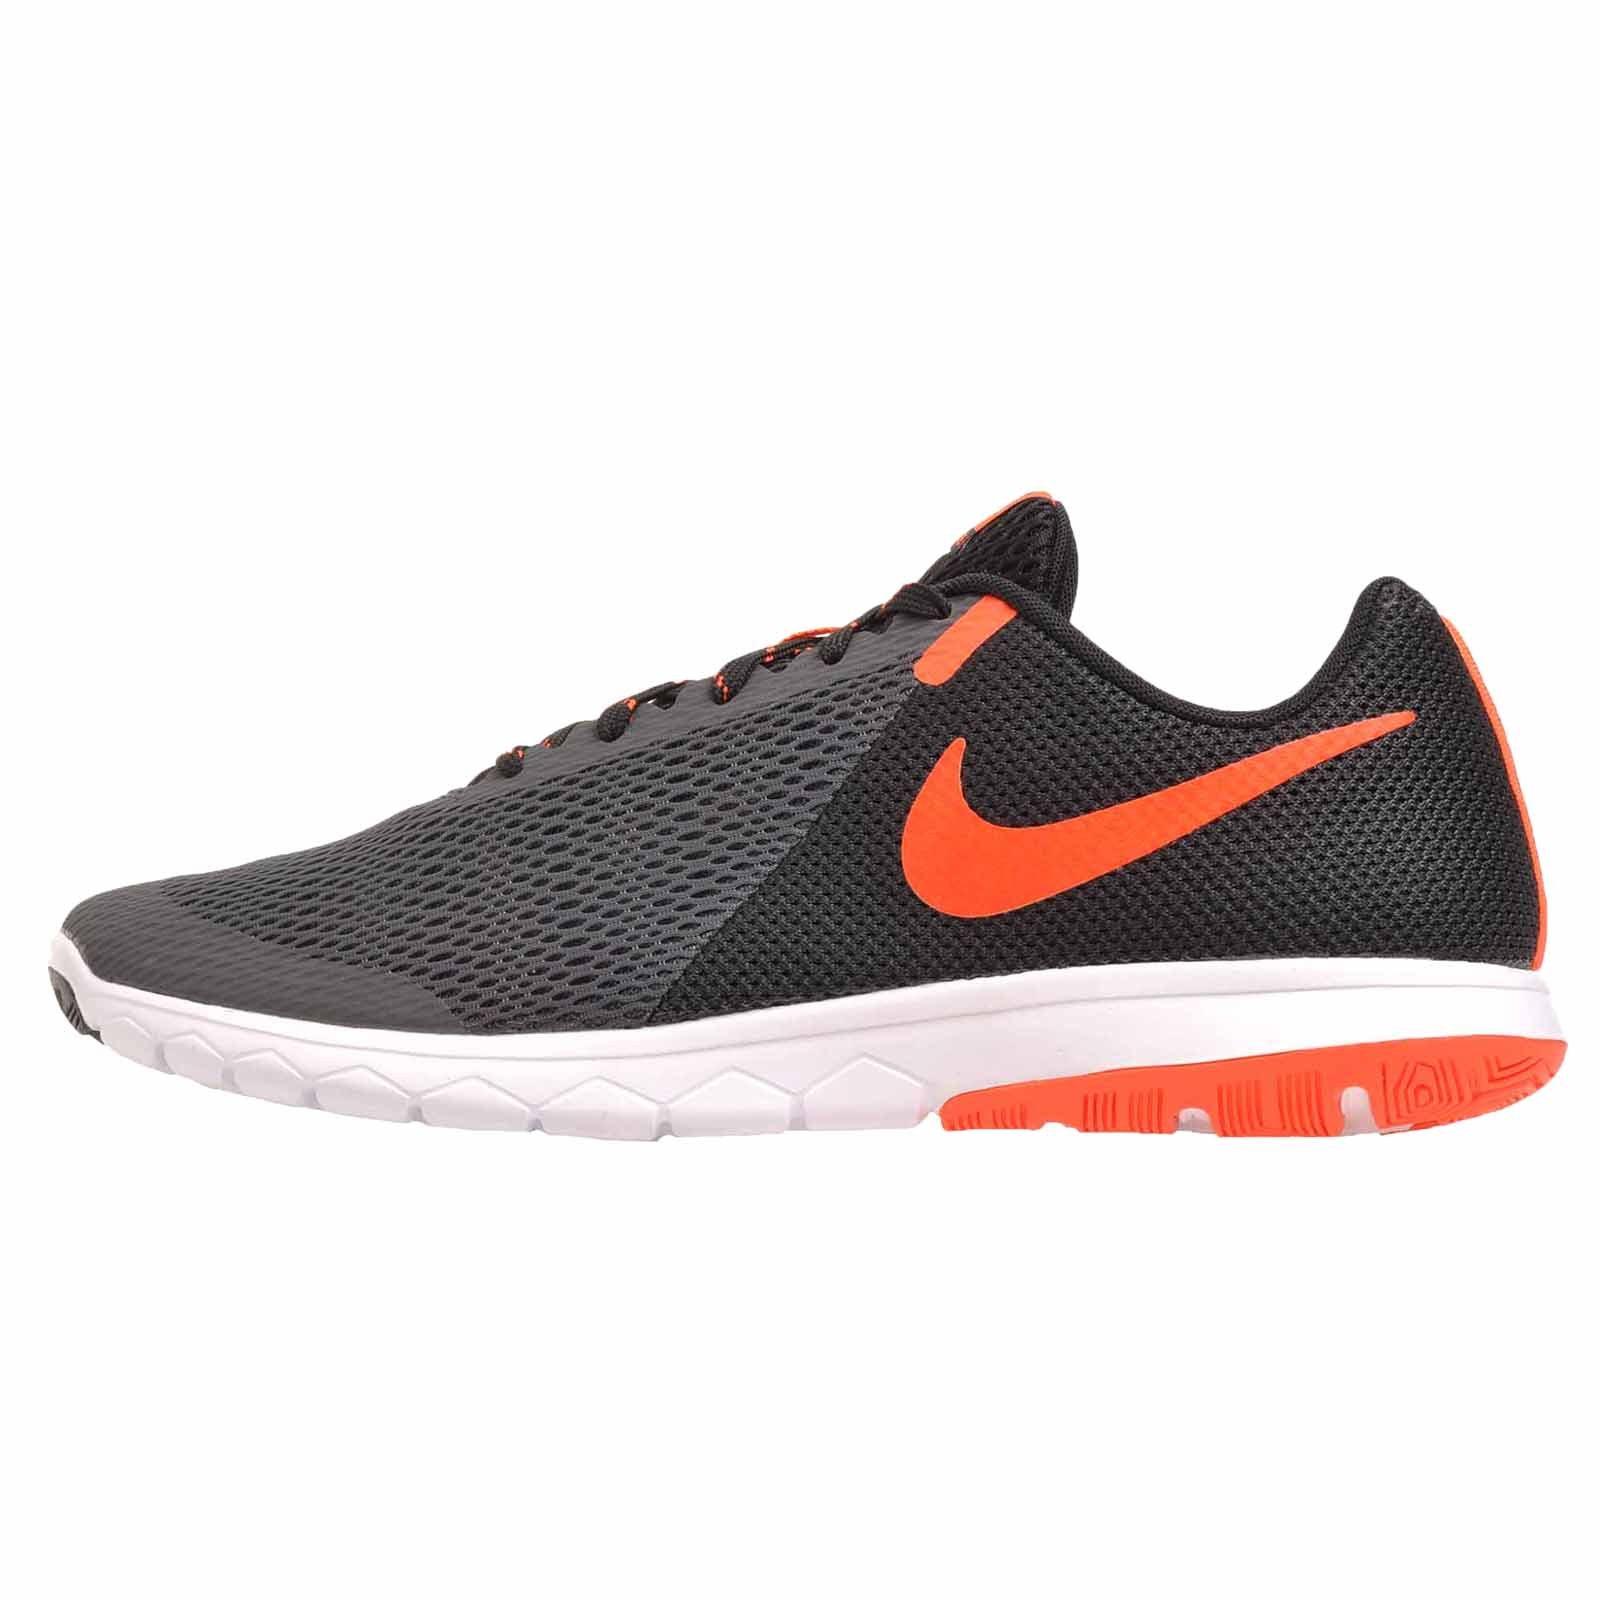 8.5 Flex Experience RN 5 Running Shoe